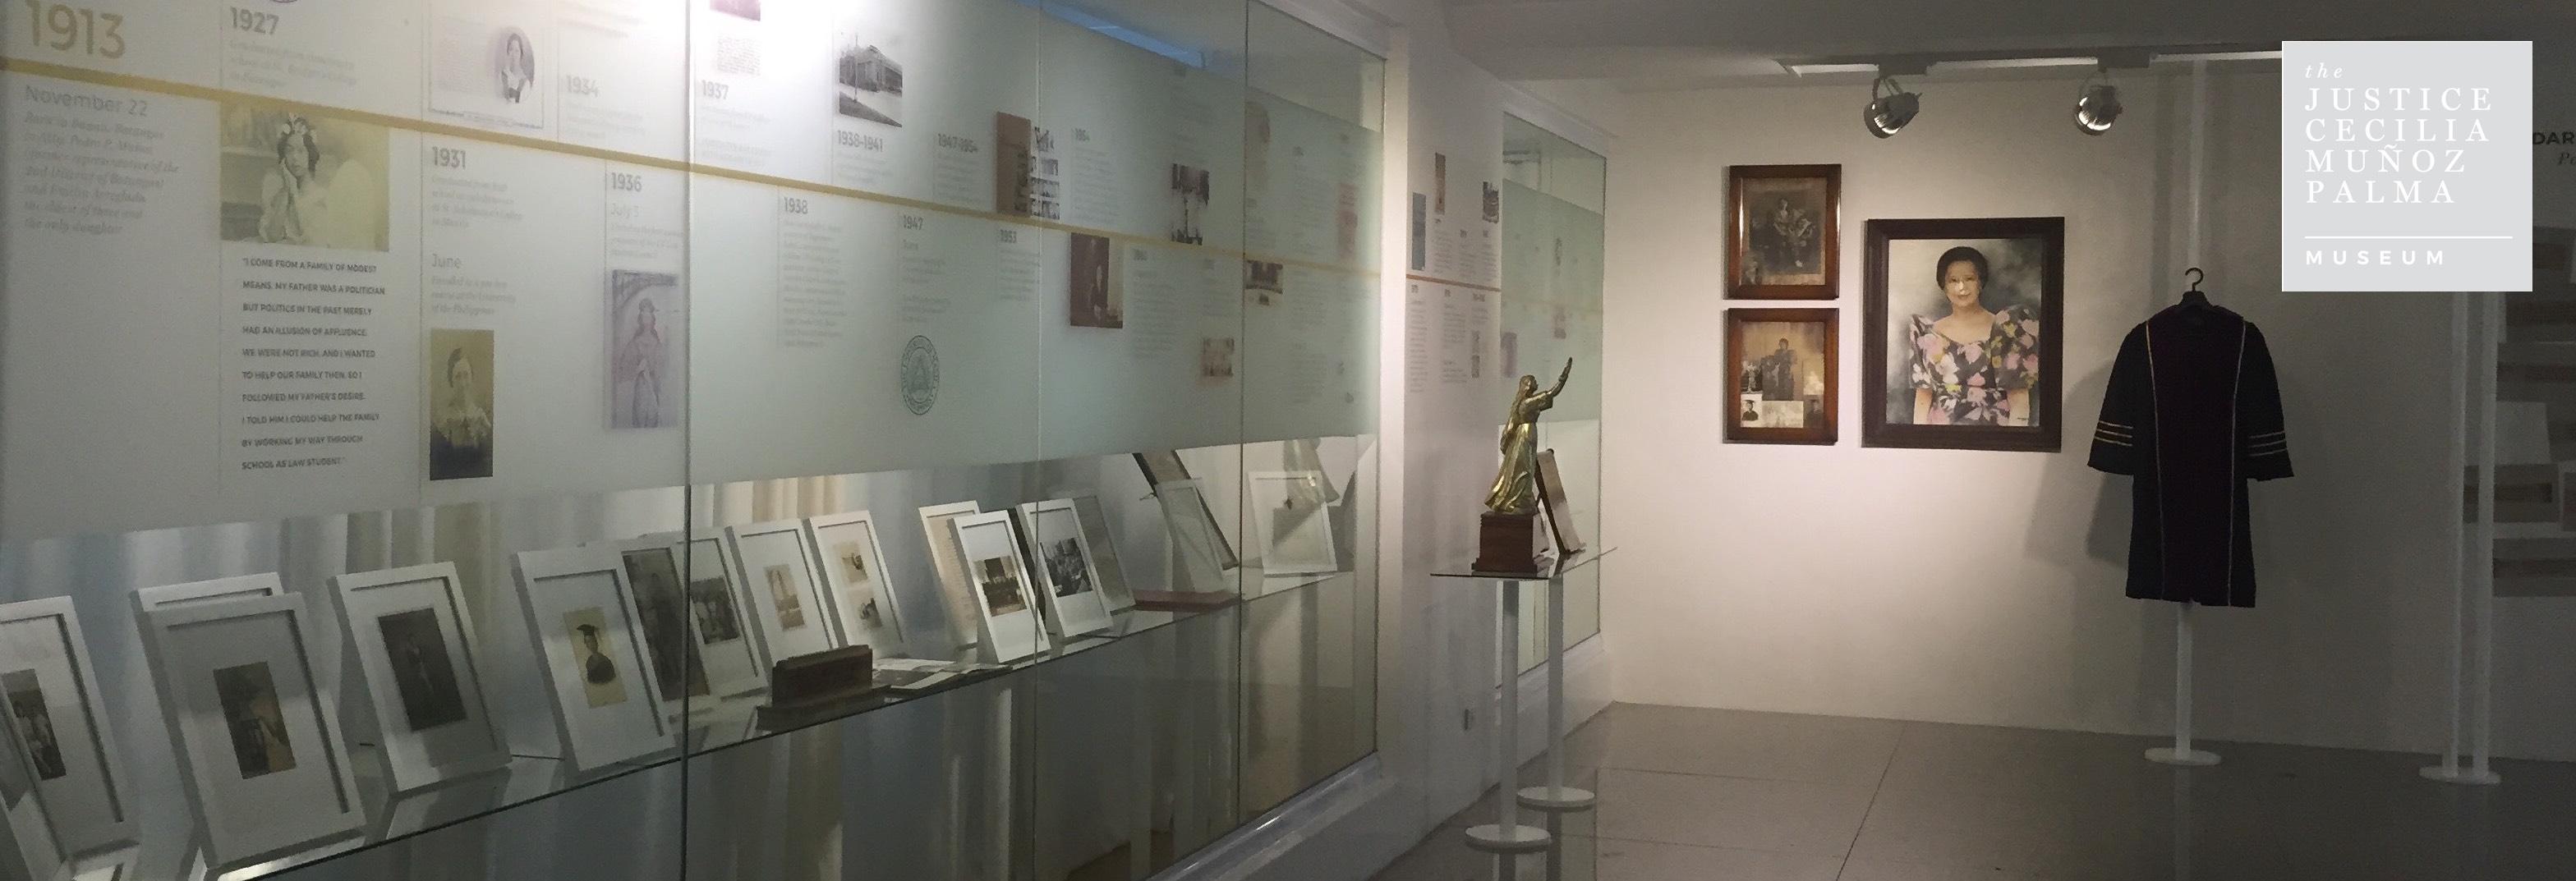 Inspiration awaits you at the Justice Palma Museum